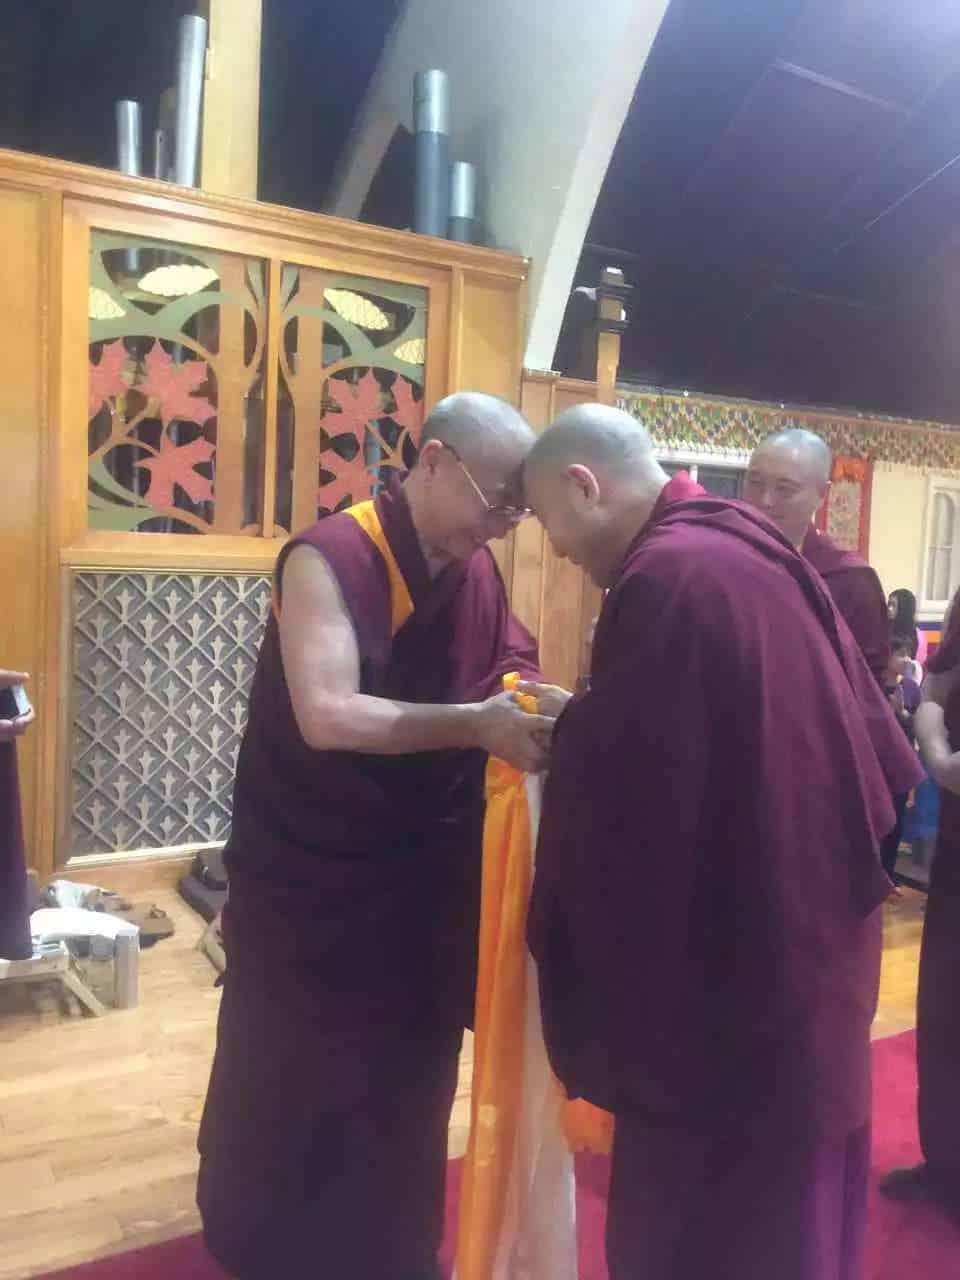 gosok-rinpoche-toronto-2016-ab543e06ba81b3b49bee2df57245f4a